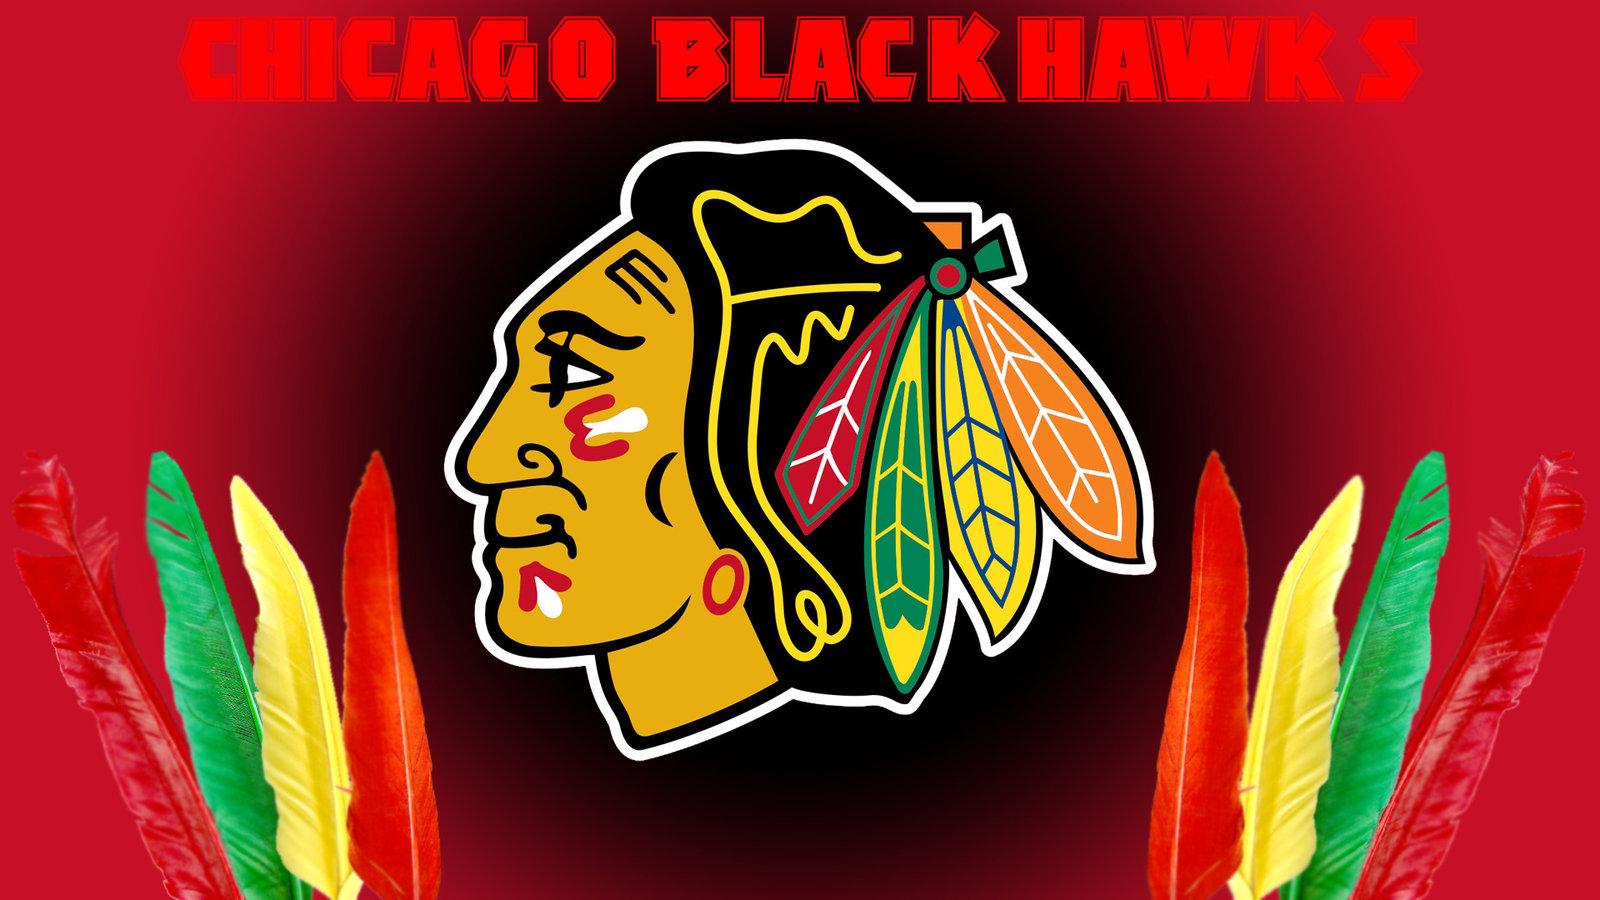 HQ Chicago Blackhawks Wallpapers | File 254.89Kb